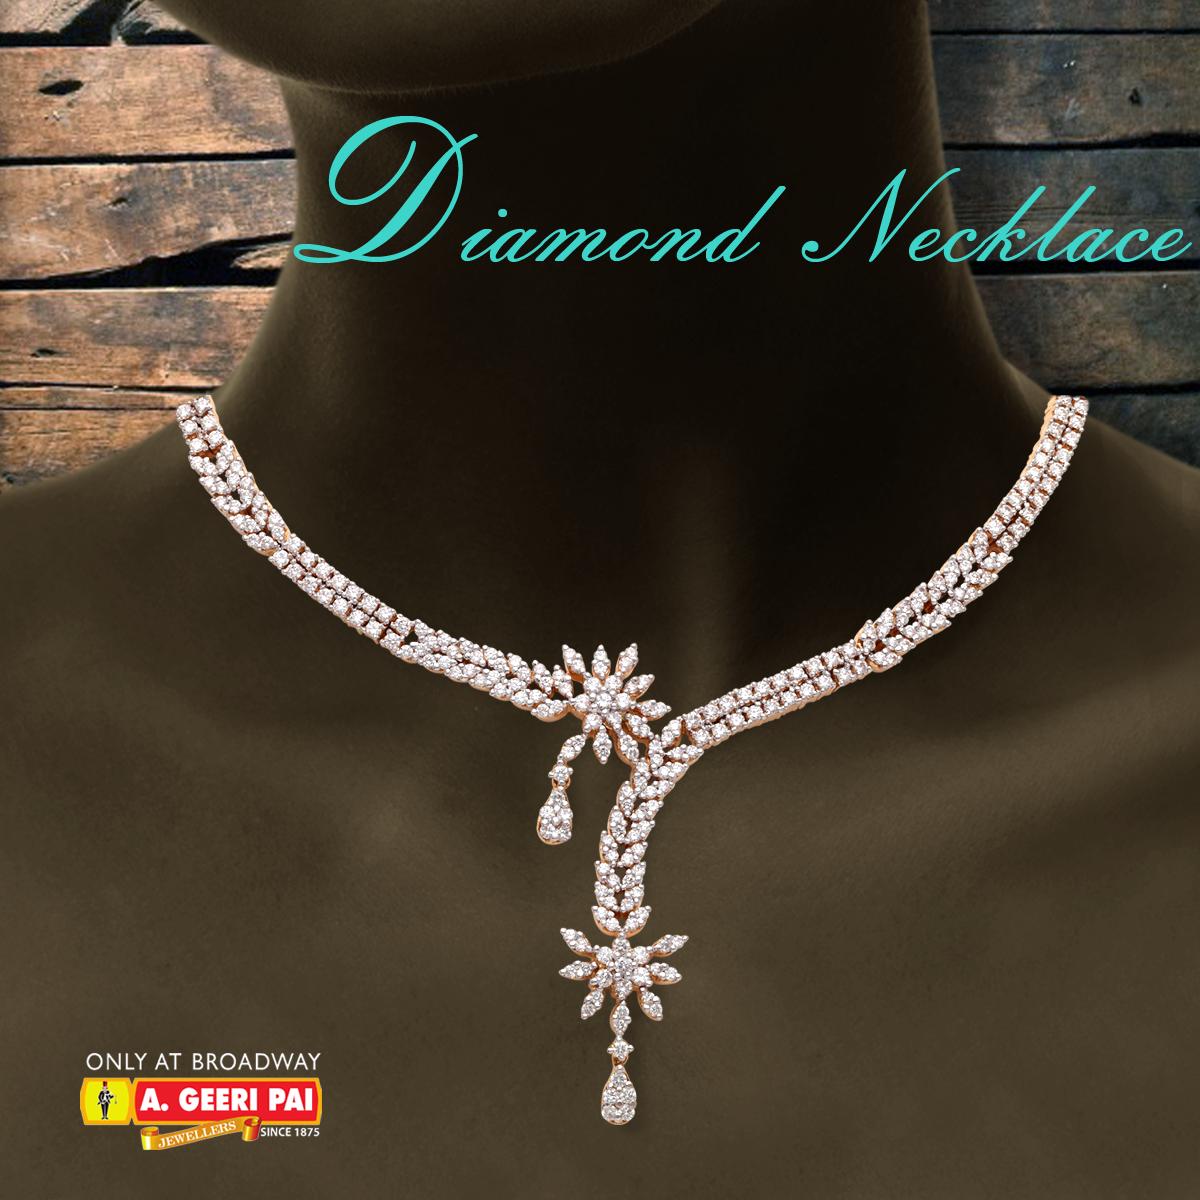 Diamond Necklace Price enquiries use the following link: http://goo.gl/cBBaou http://www.facebook.com/AGeeriPaiBroadway #Geeripai #ageeripai #gold #goldjewellery #jewellery #Diamond